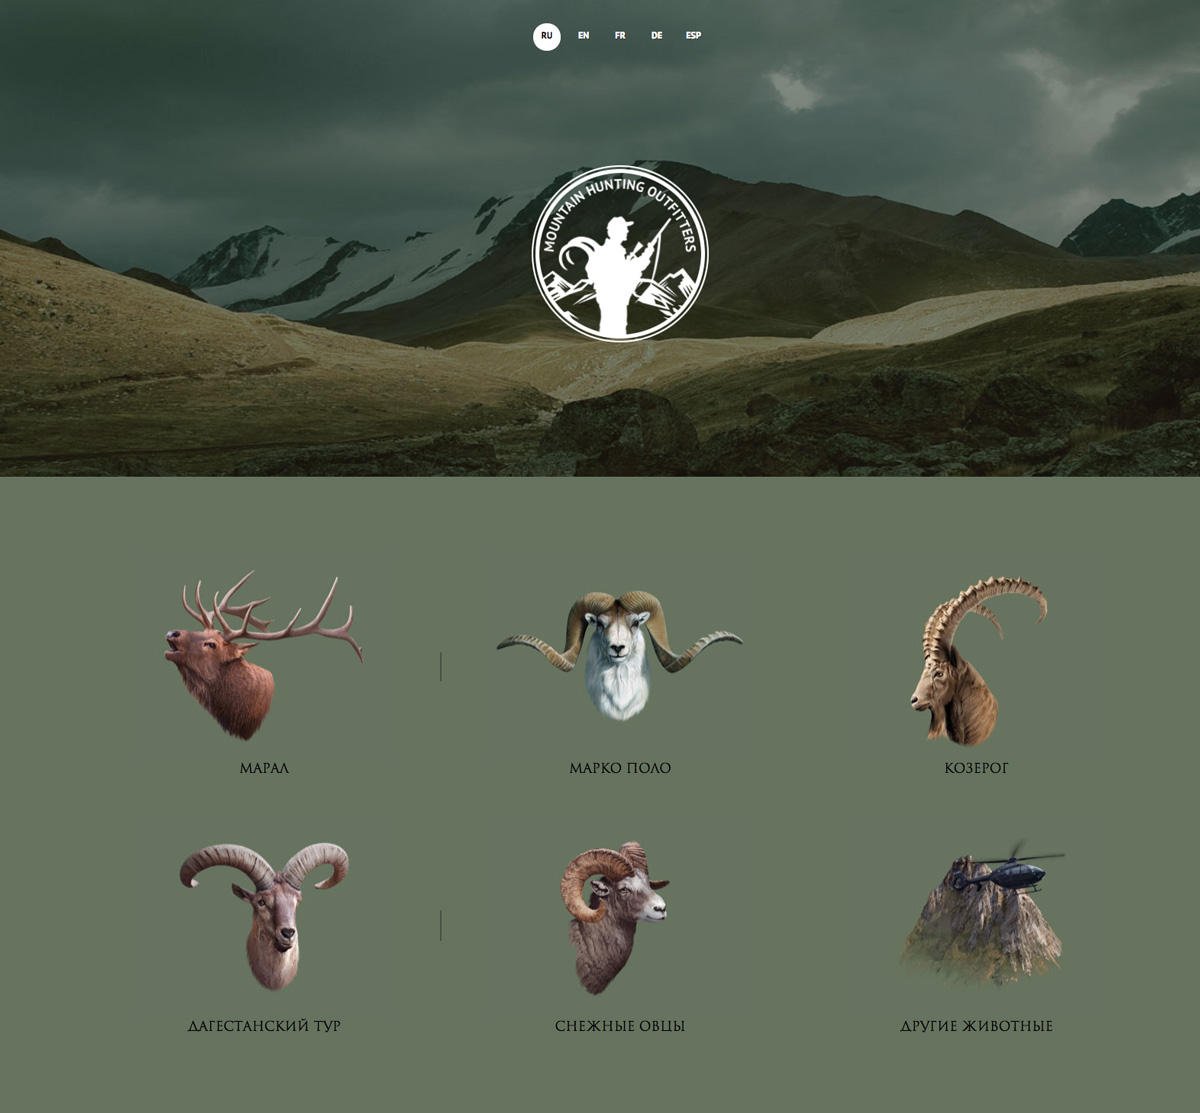 Mountainhunting - сайт для охотников